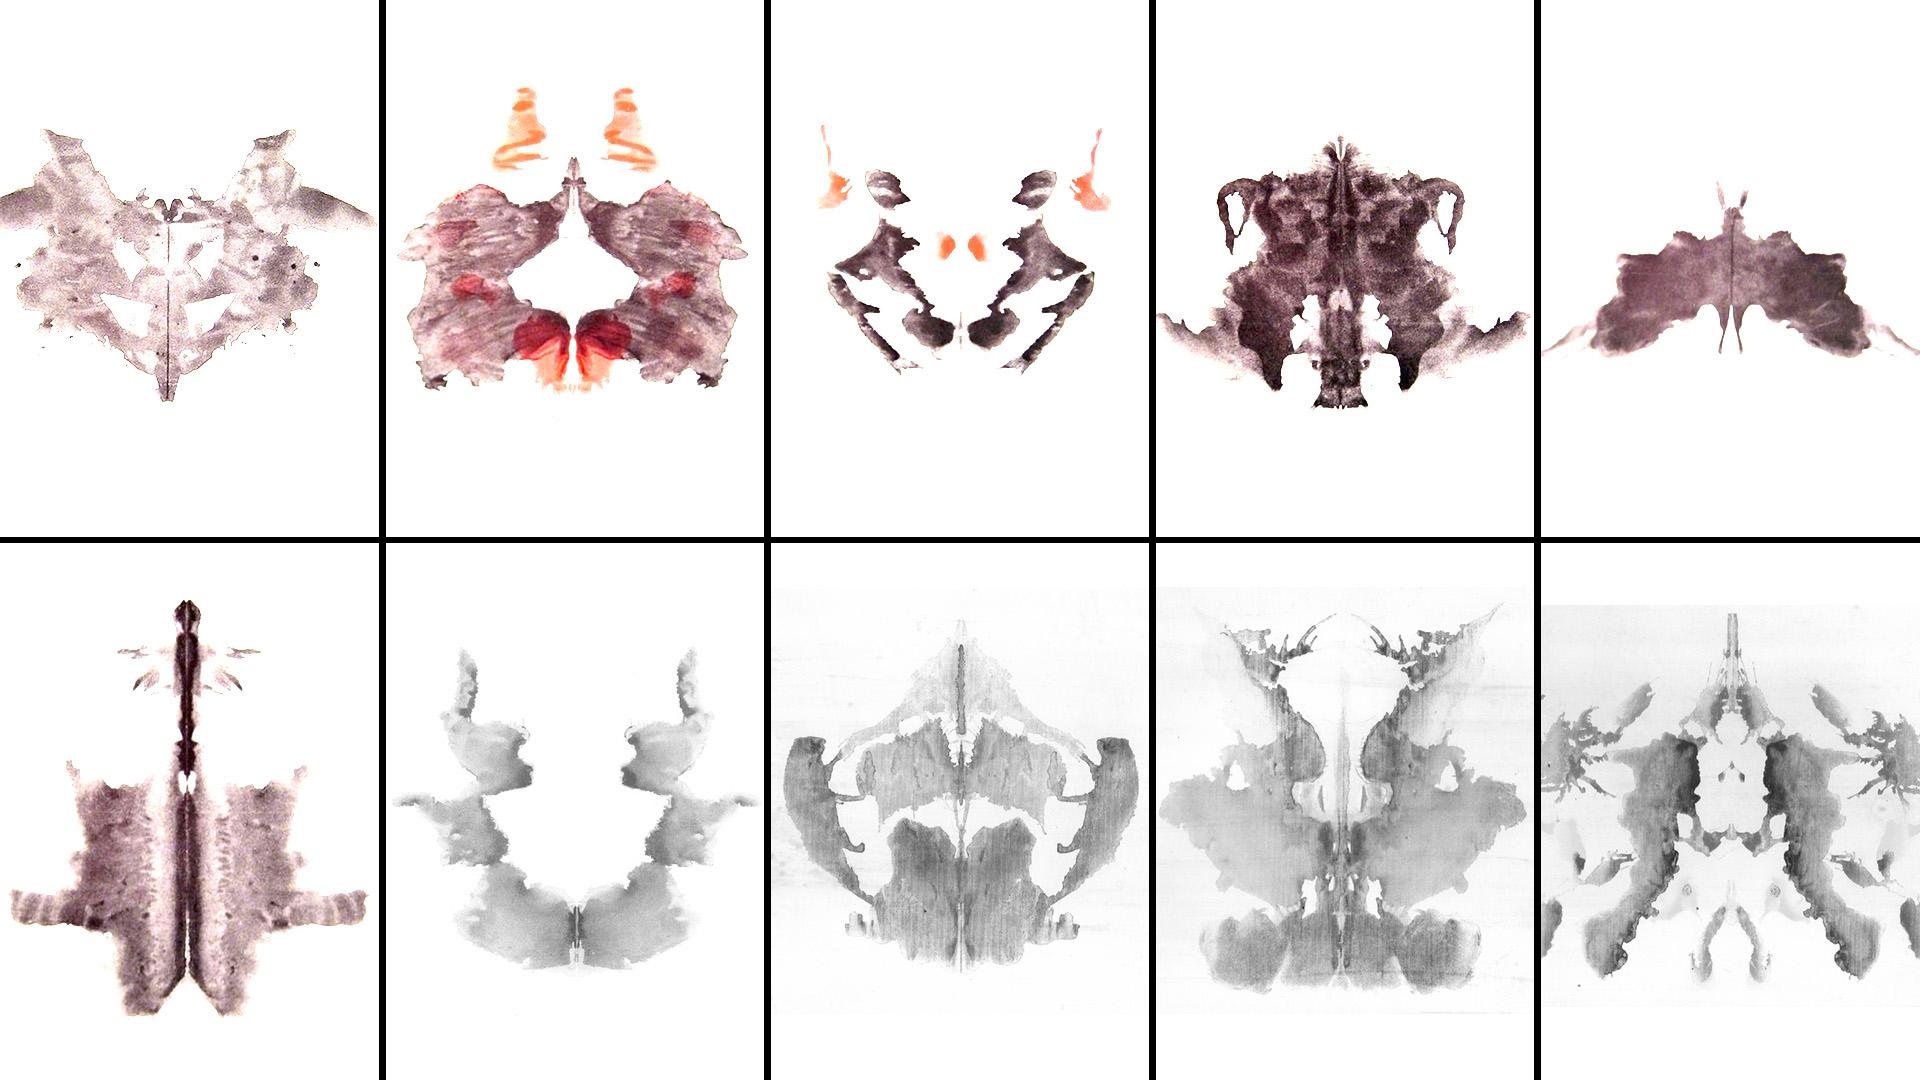 Test de Rorschach: ¿qué significa cada imagen? - Infobae